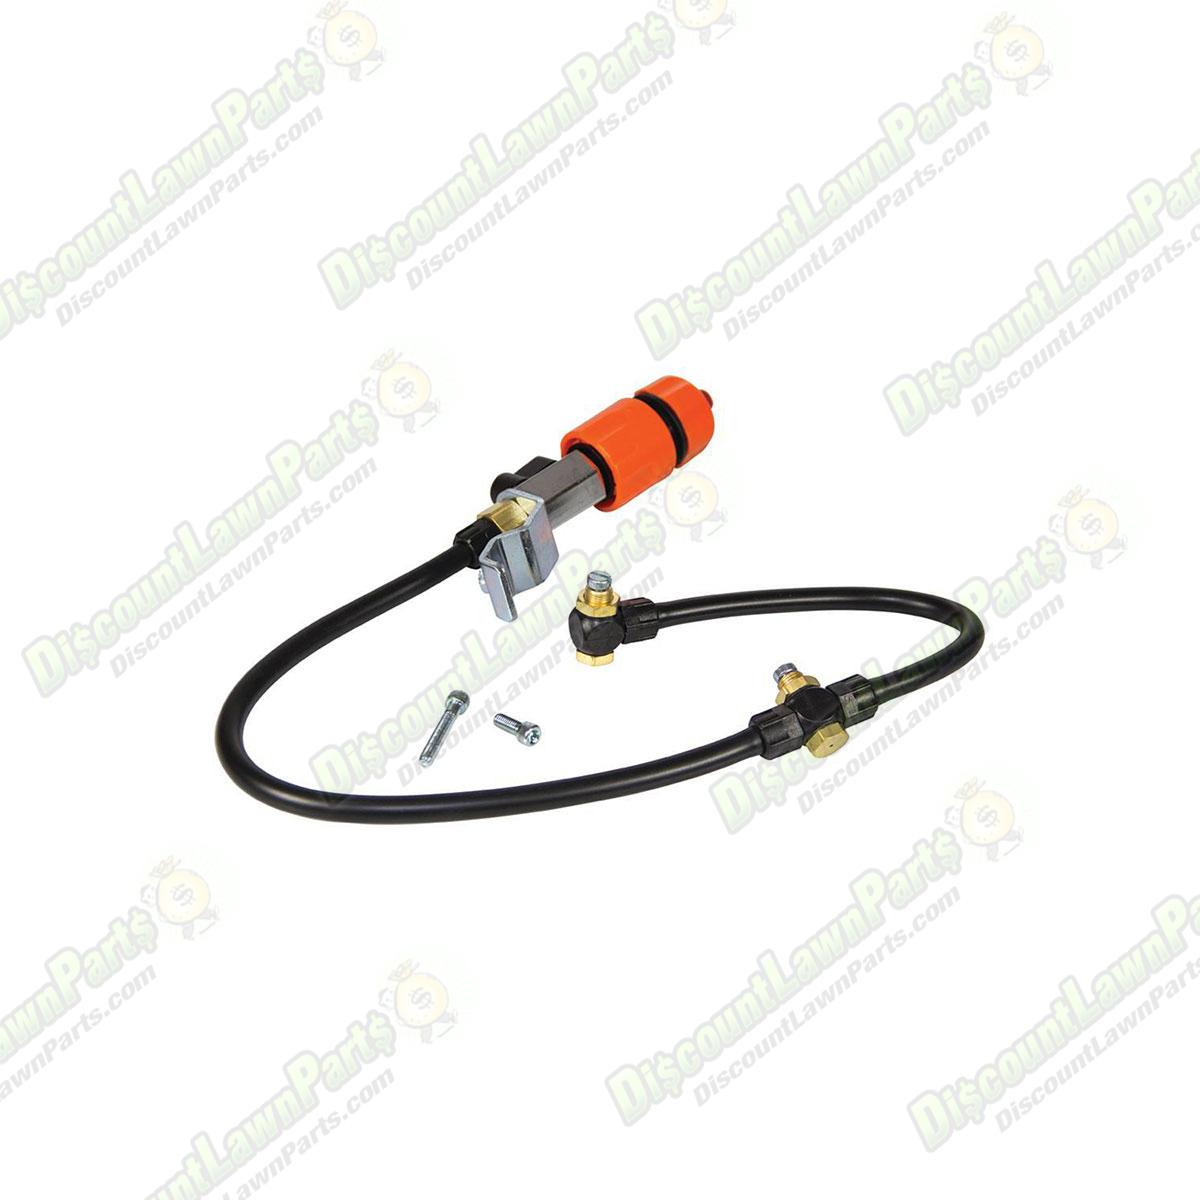 Water Attachment Kit / Stihl 4201 007 1014